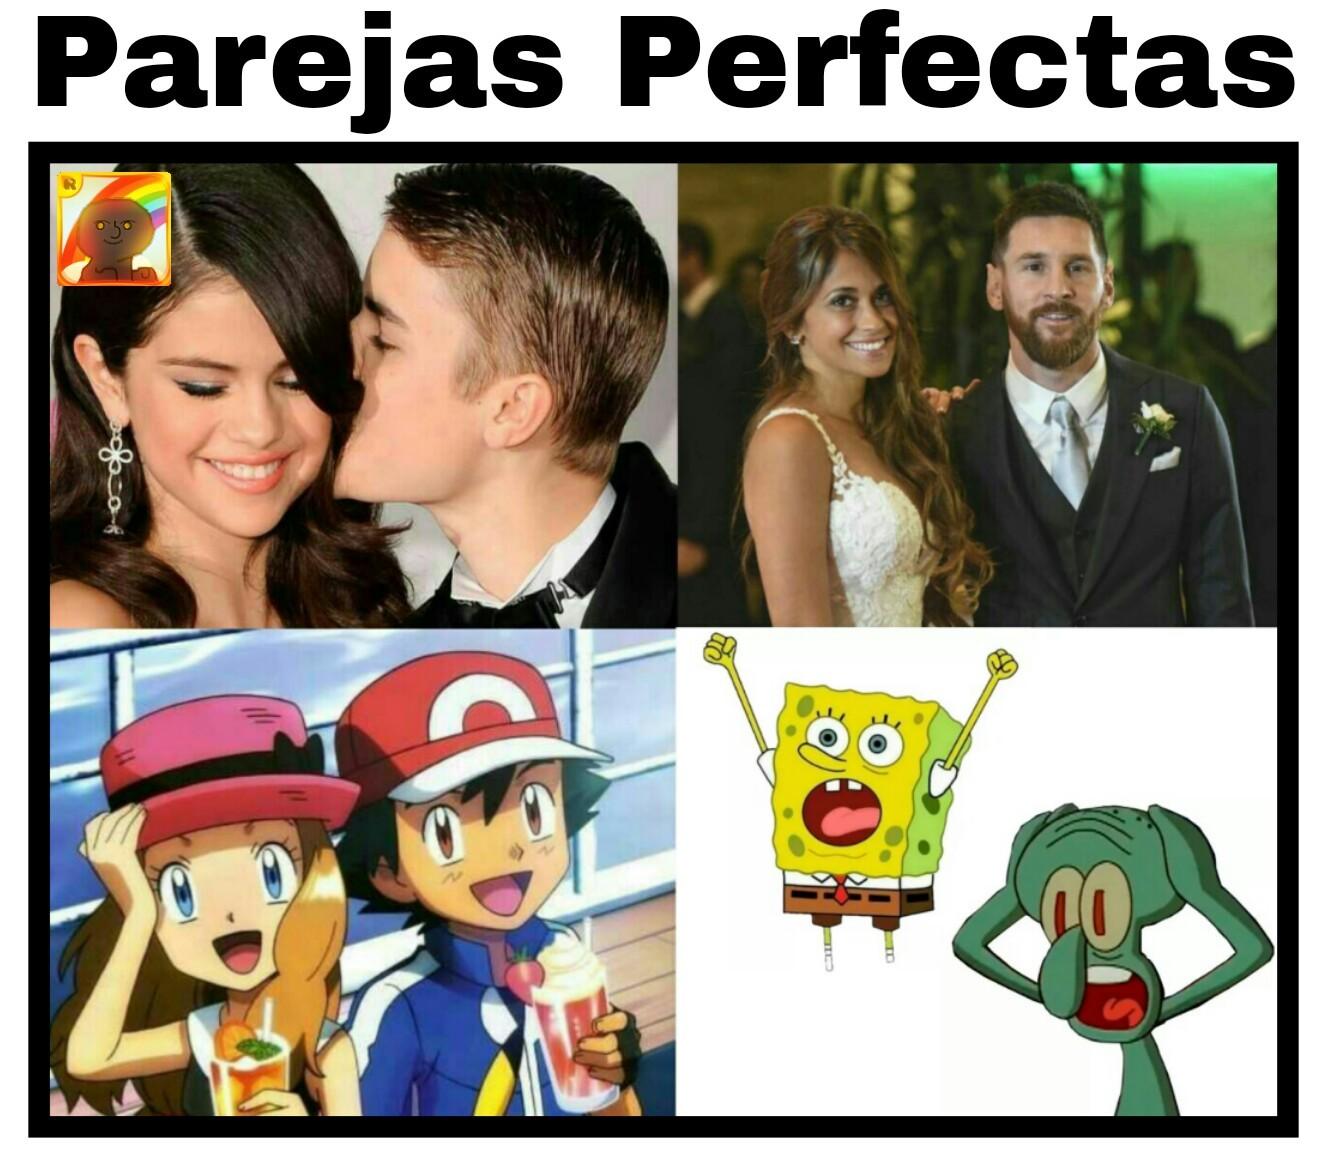 Parejas Perfectas - meme